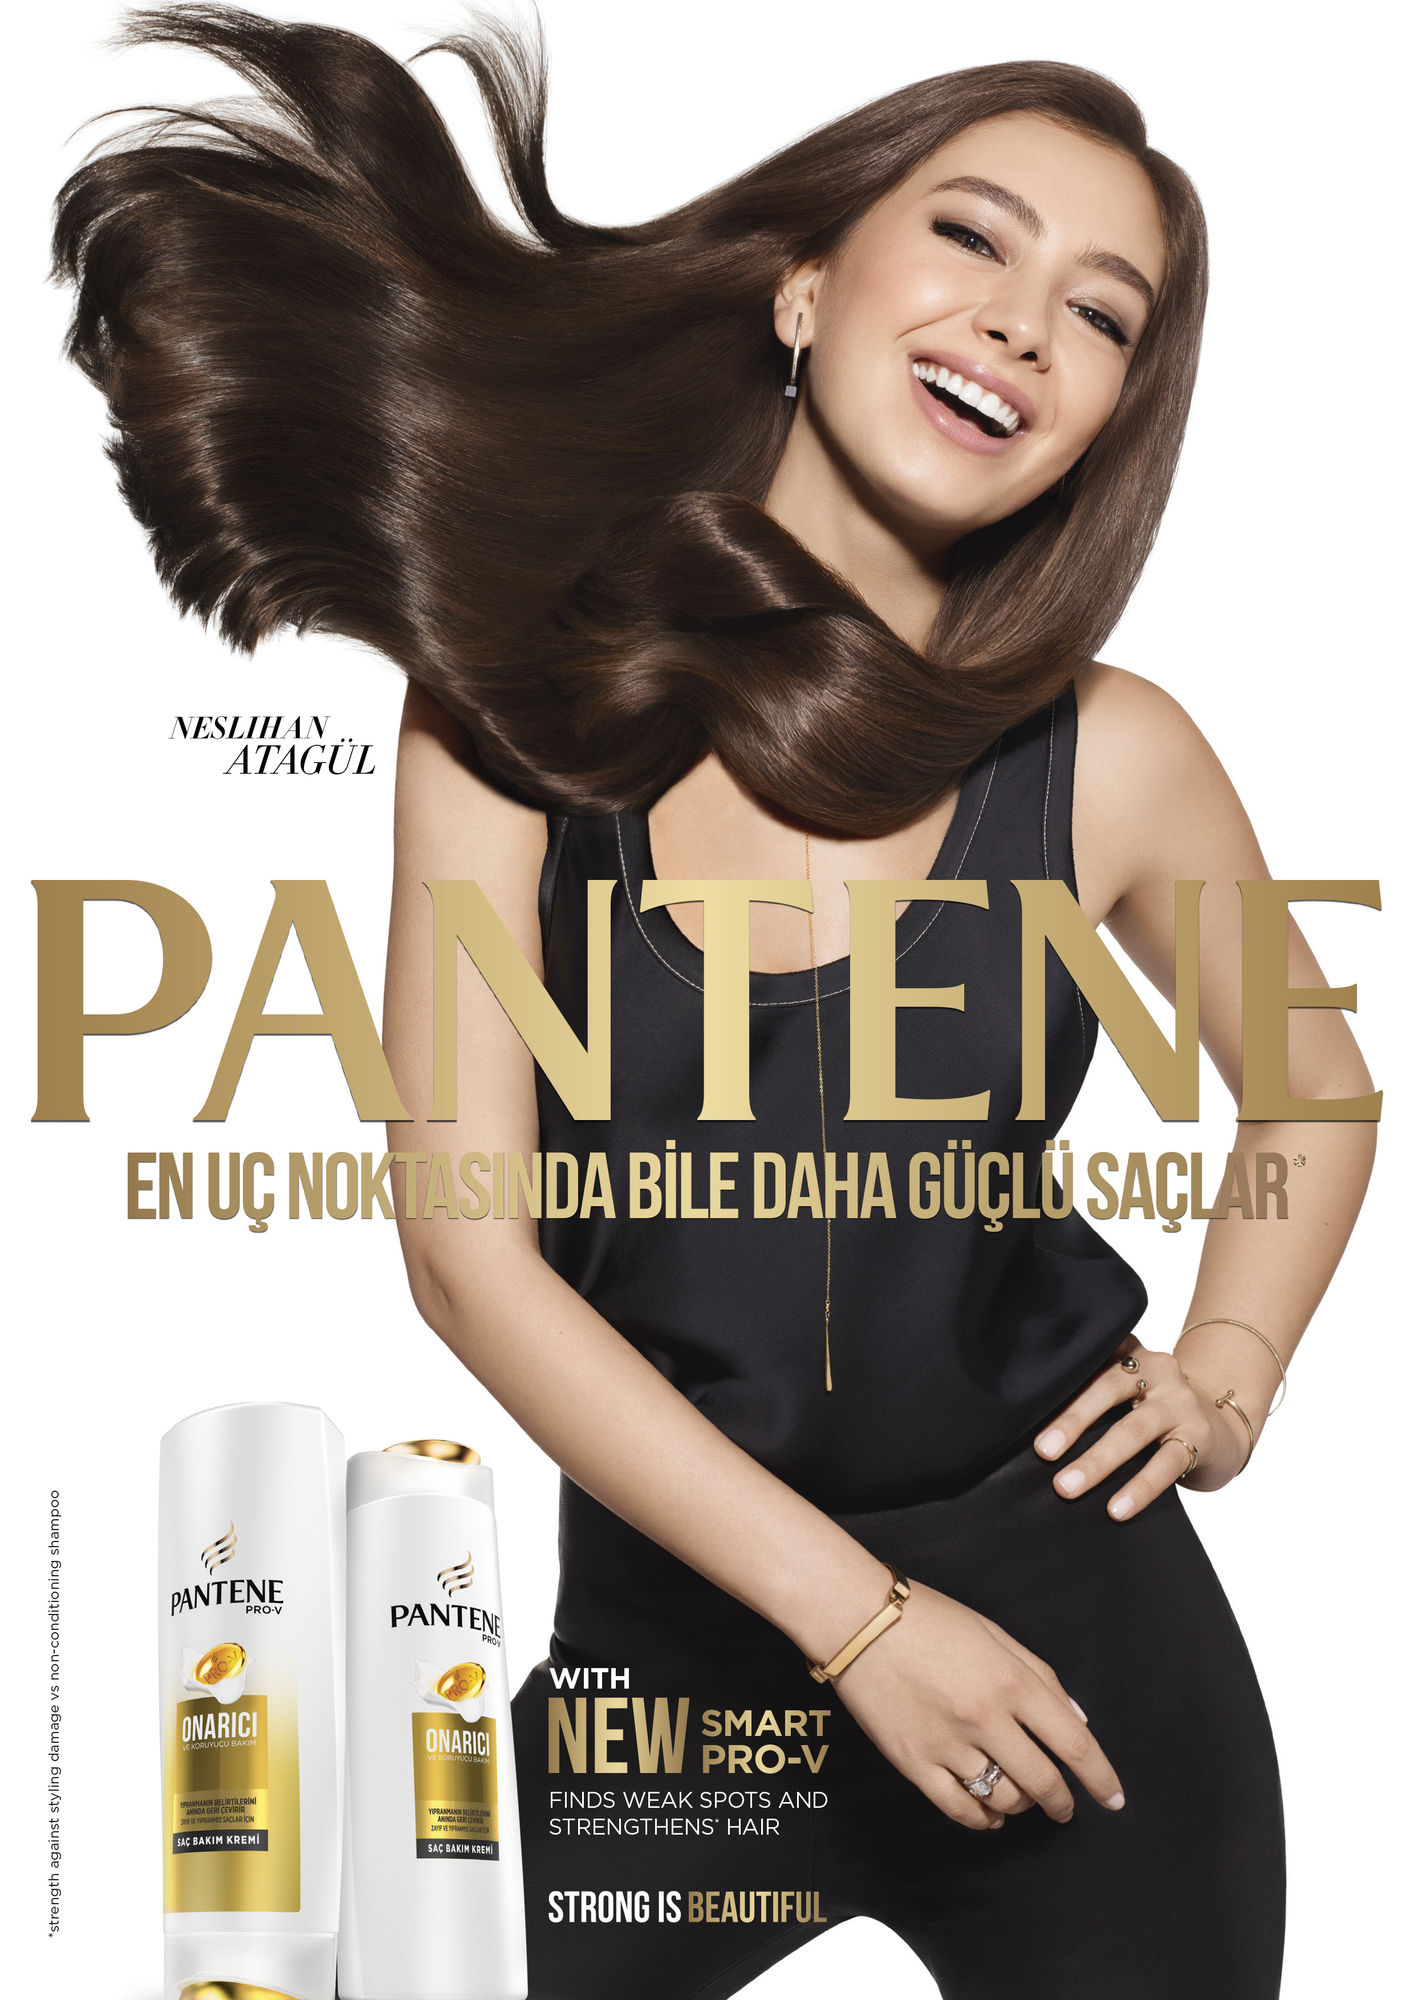 Pantene | European Campaign